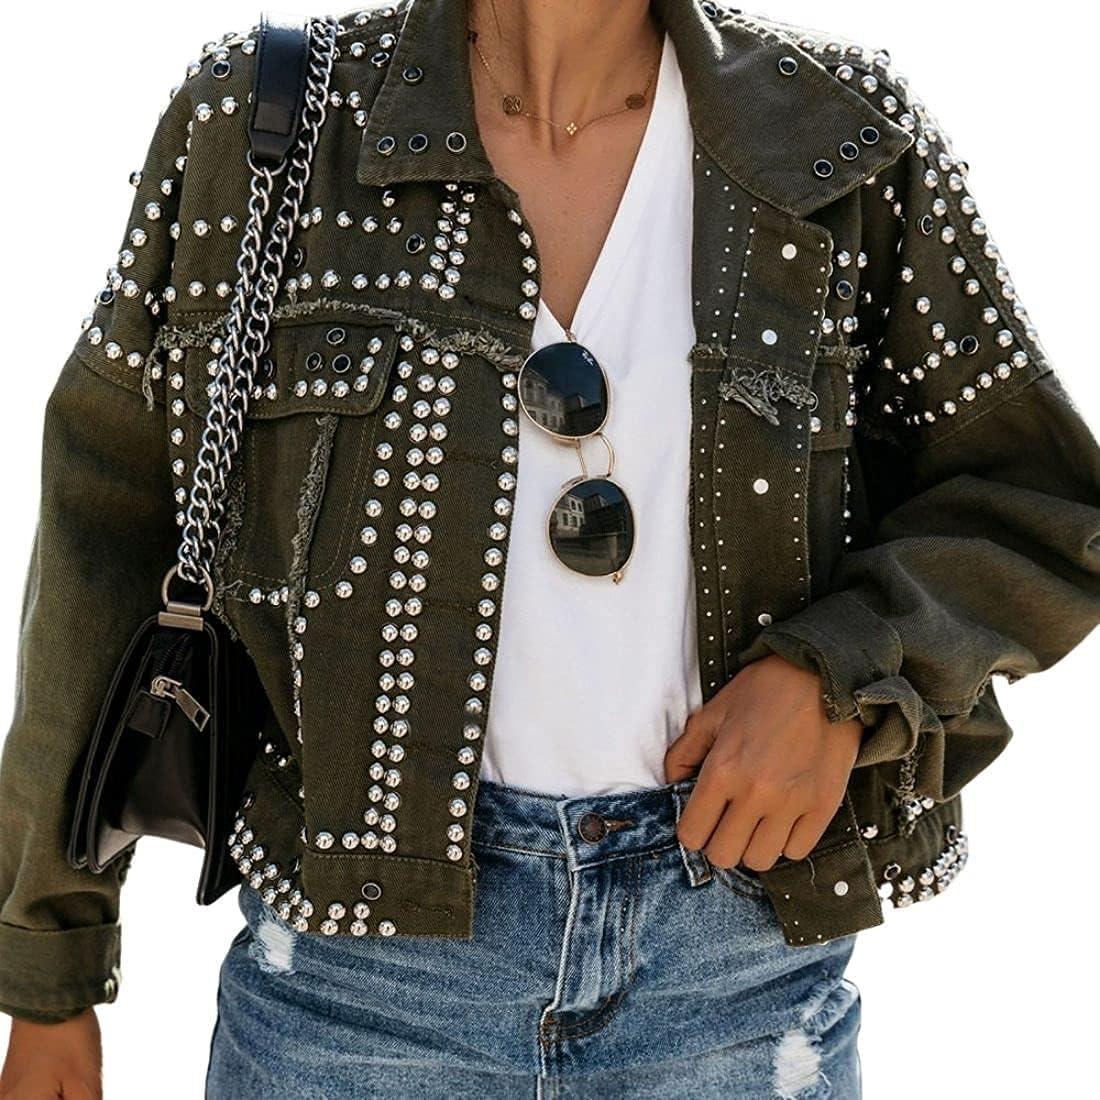 Omoone Women's Long Sleeve Rivet Denim Studded Was Popular product Casual Charlotte Mall Jacket